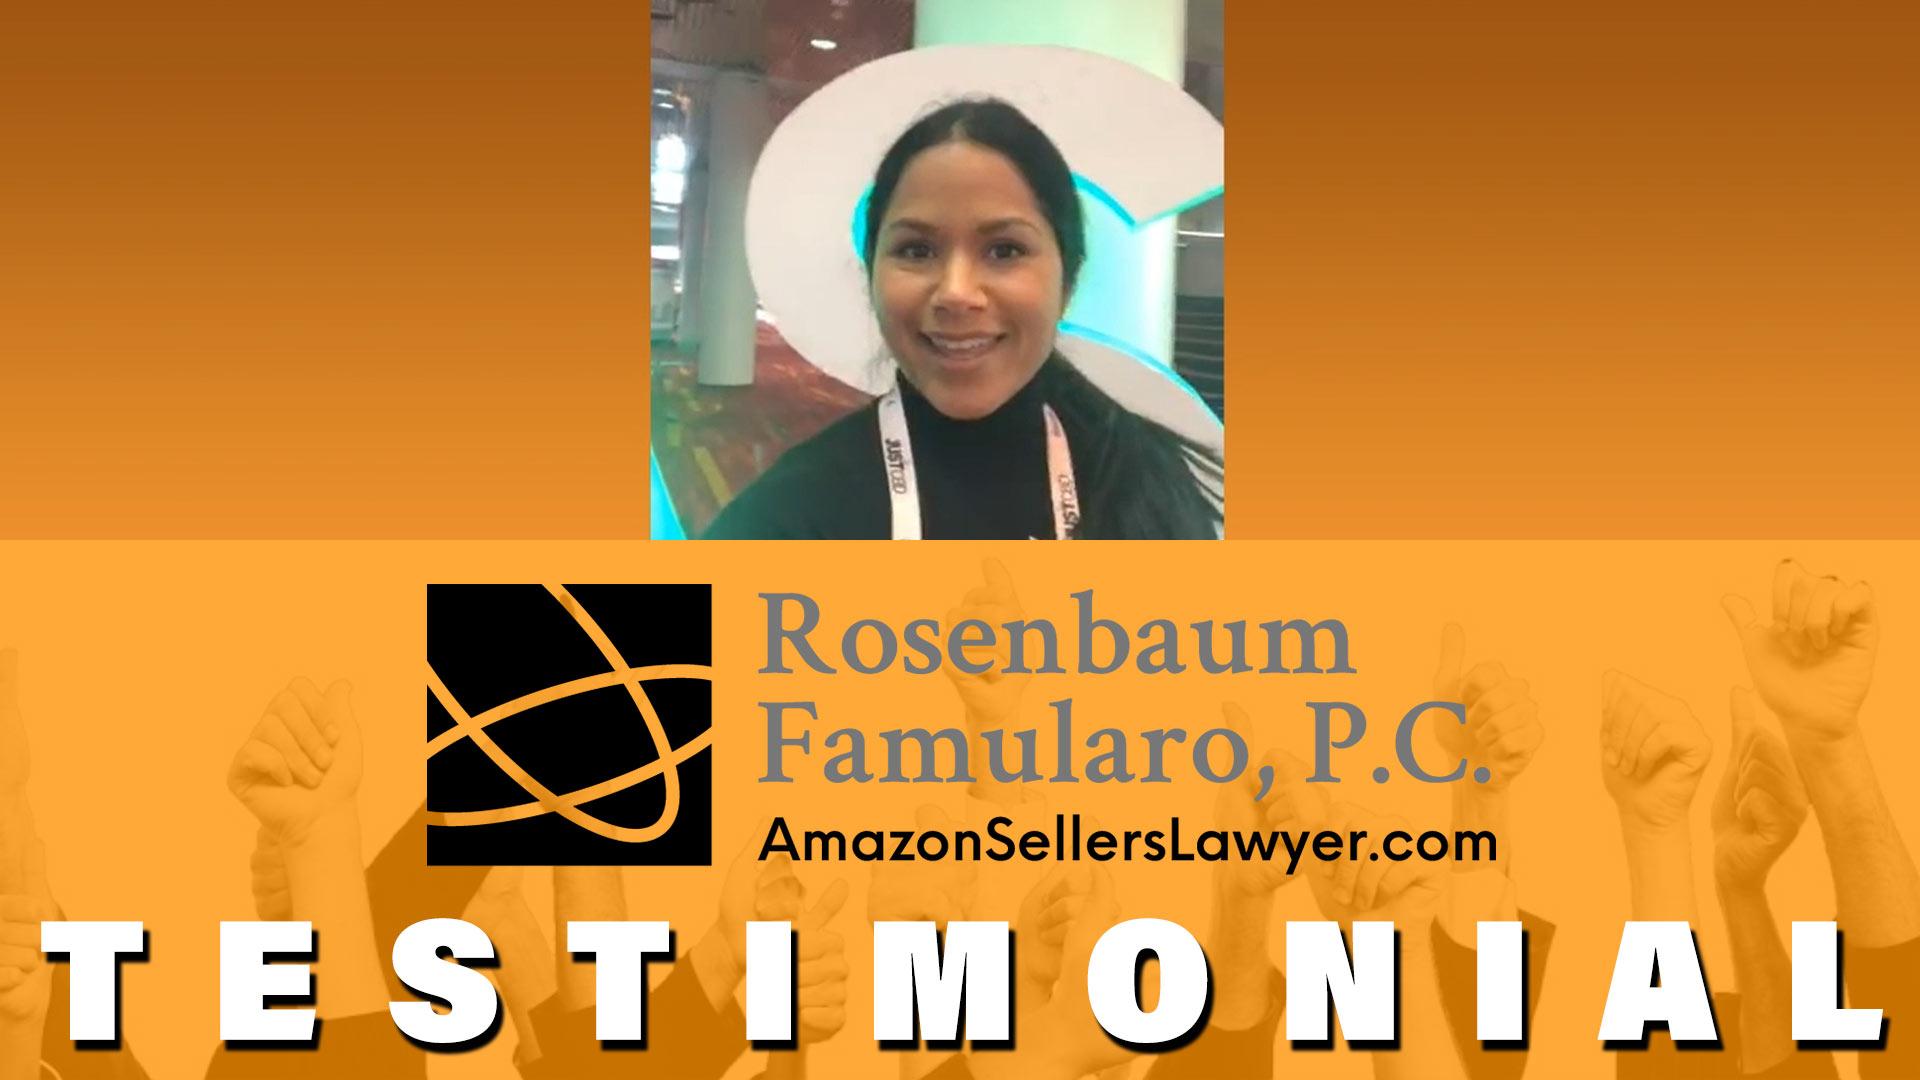 ASD market week testimonial for Amazon lawyer CJ Rosenbaum